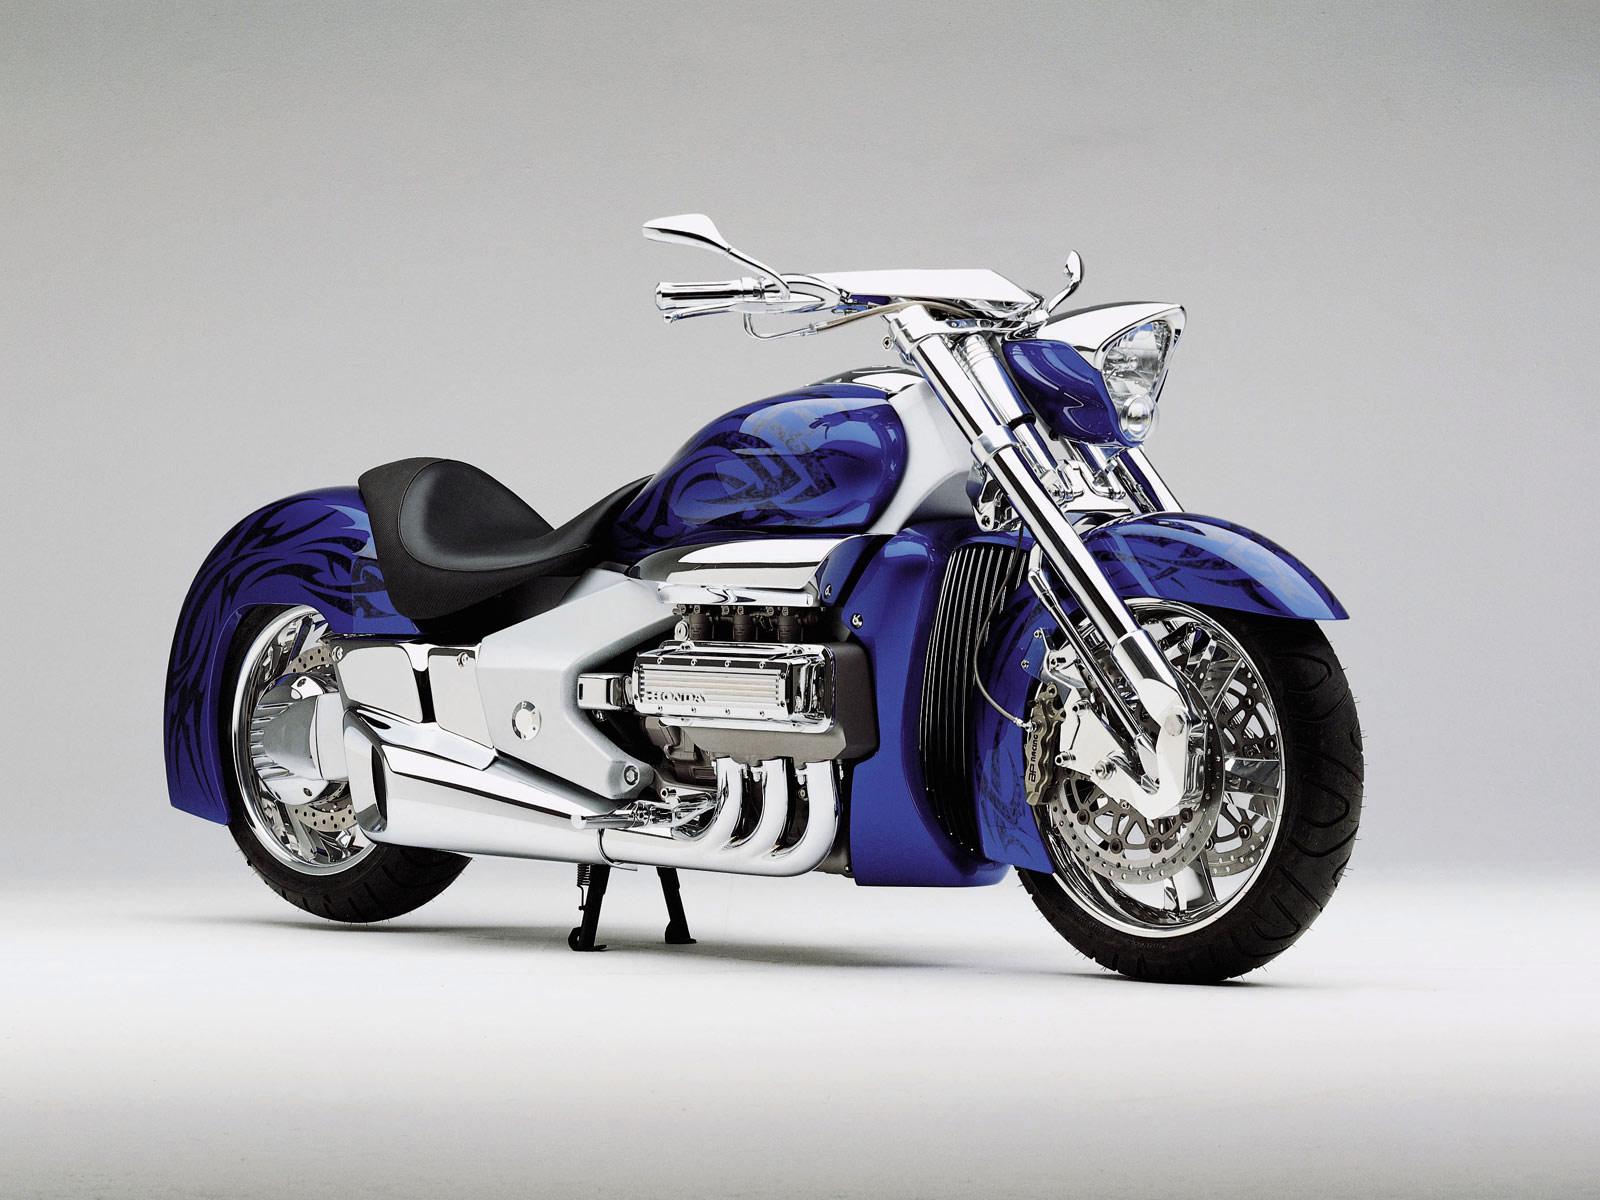 http://4.bp.blogspot.com/-YNphFH8IZjo/TiUPE-45e0I/AAAAAAAAAKY/rrJ9zFjpF_M/s1600/honda_T2_Concept_2000_car-desktop-wallpaper_05.jpg